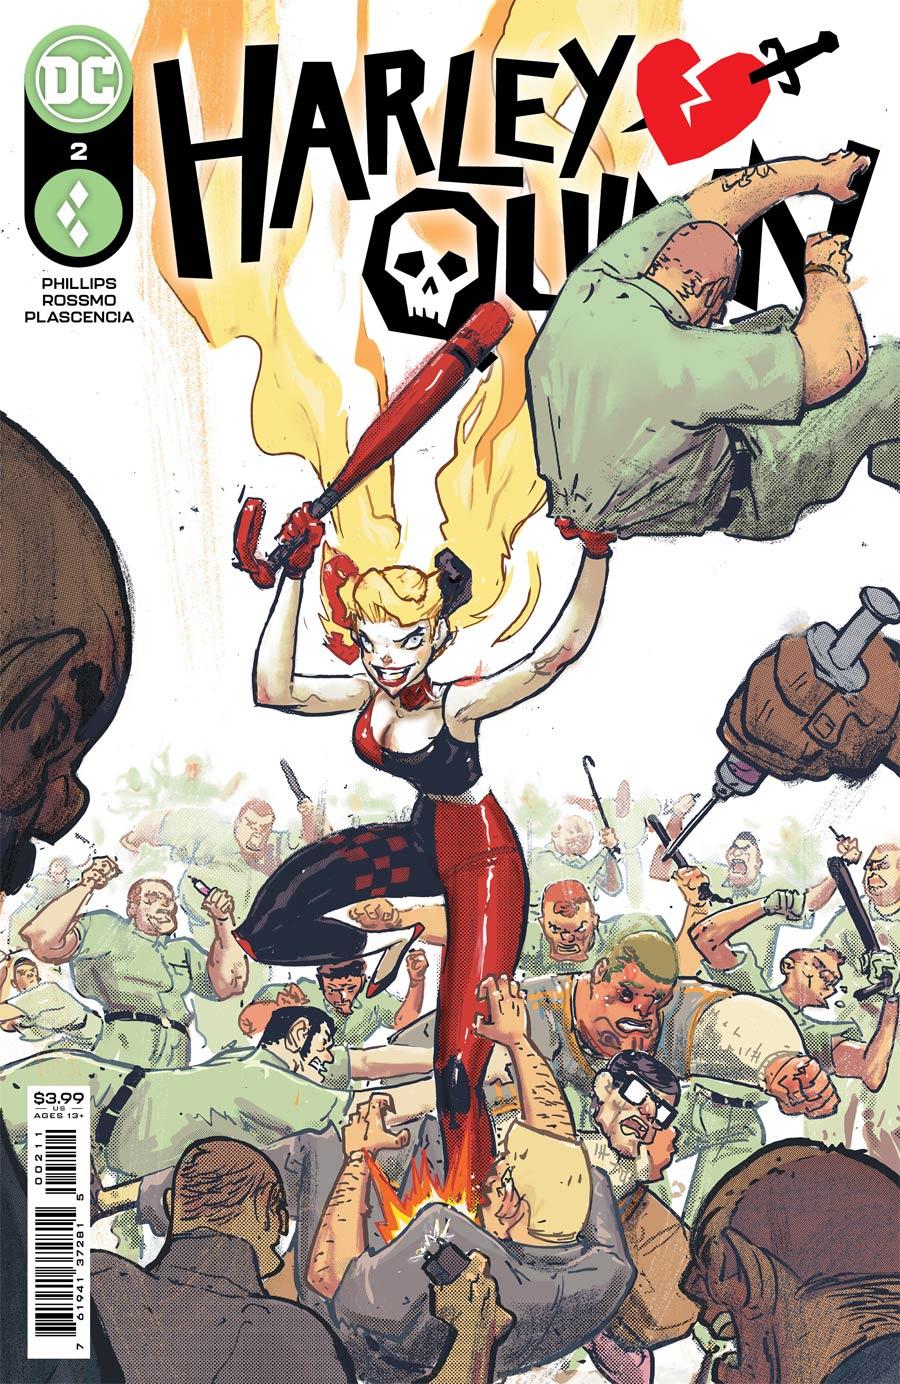 Harley Quinn Vol 4 #2 Cover A Regular Riley Rossmo Cover